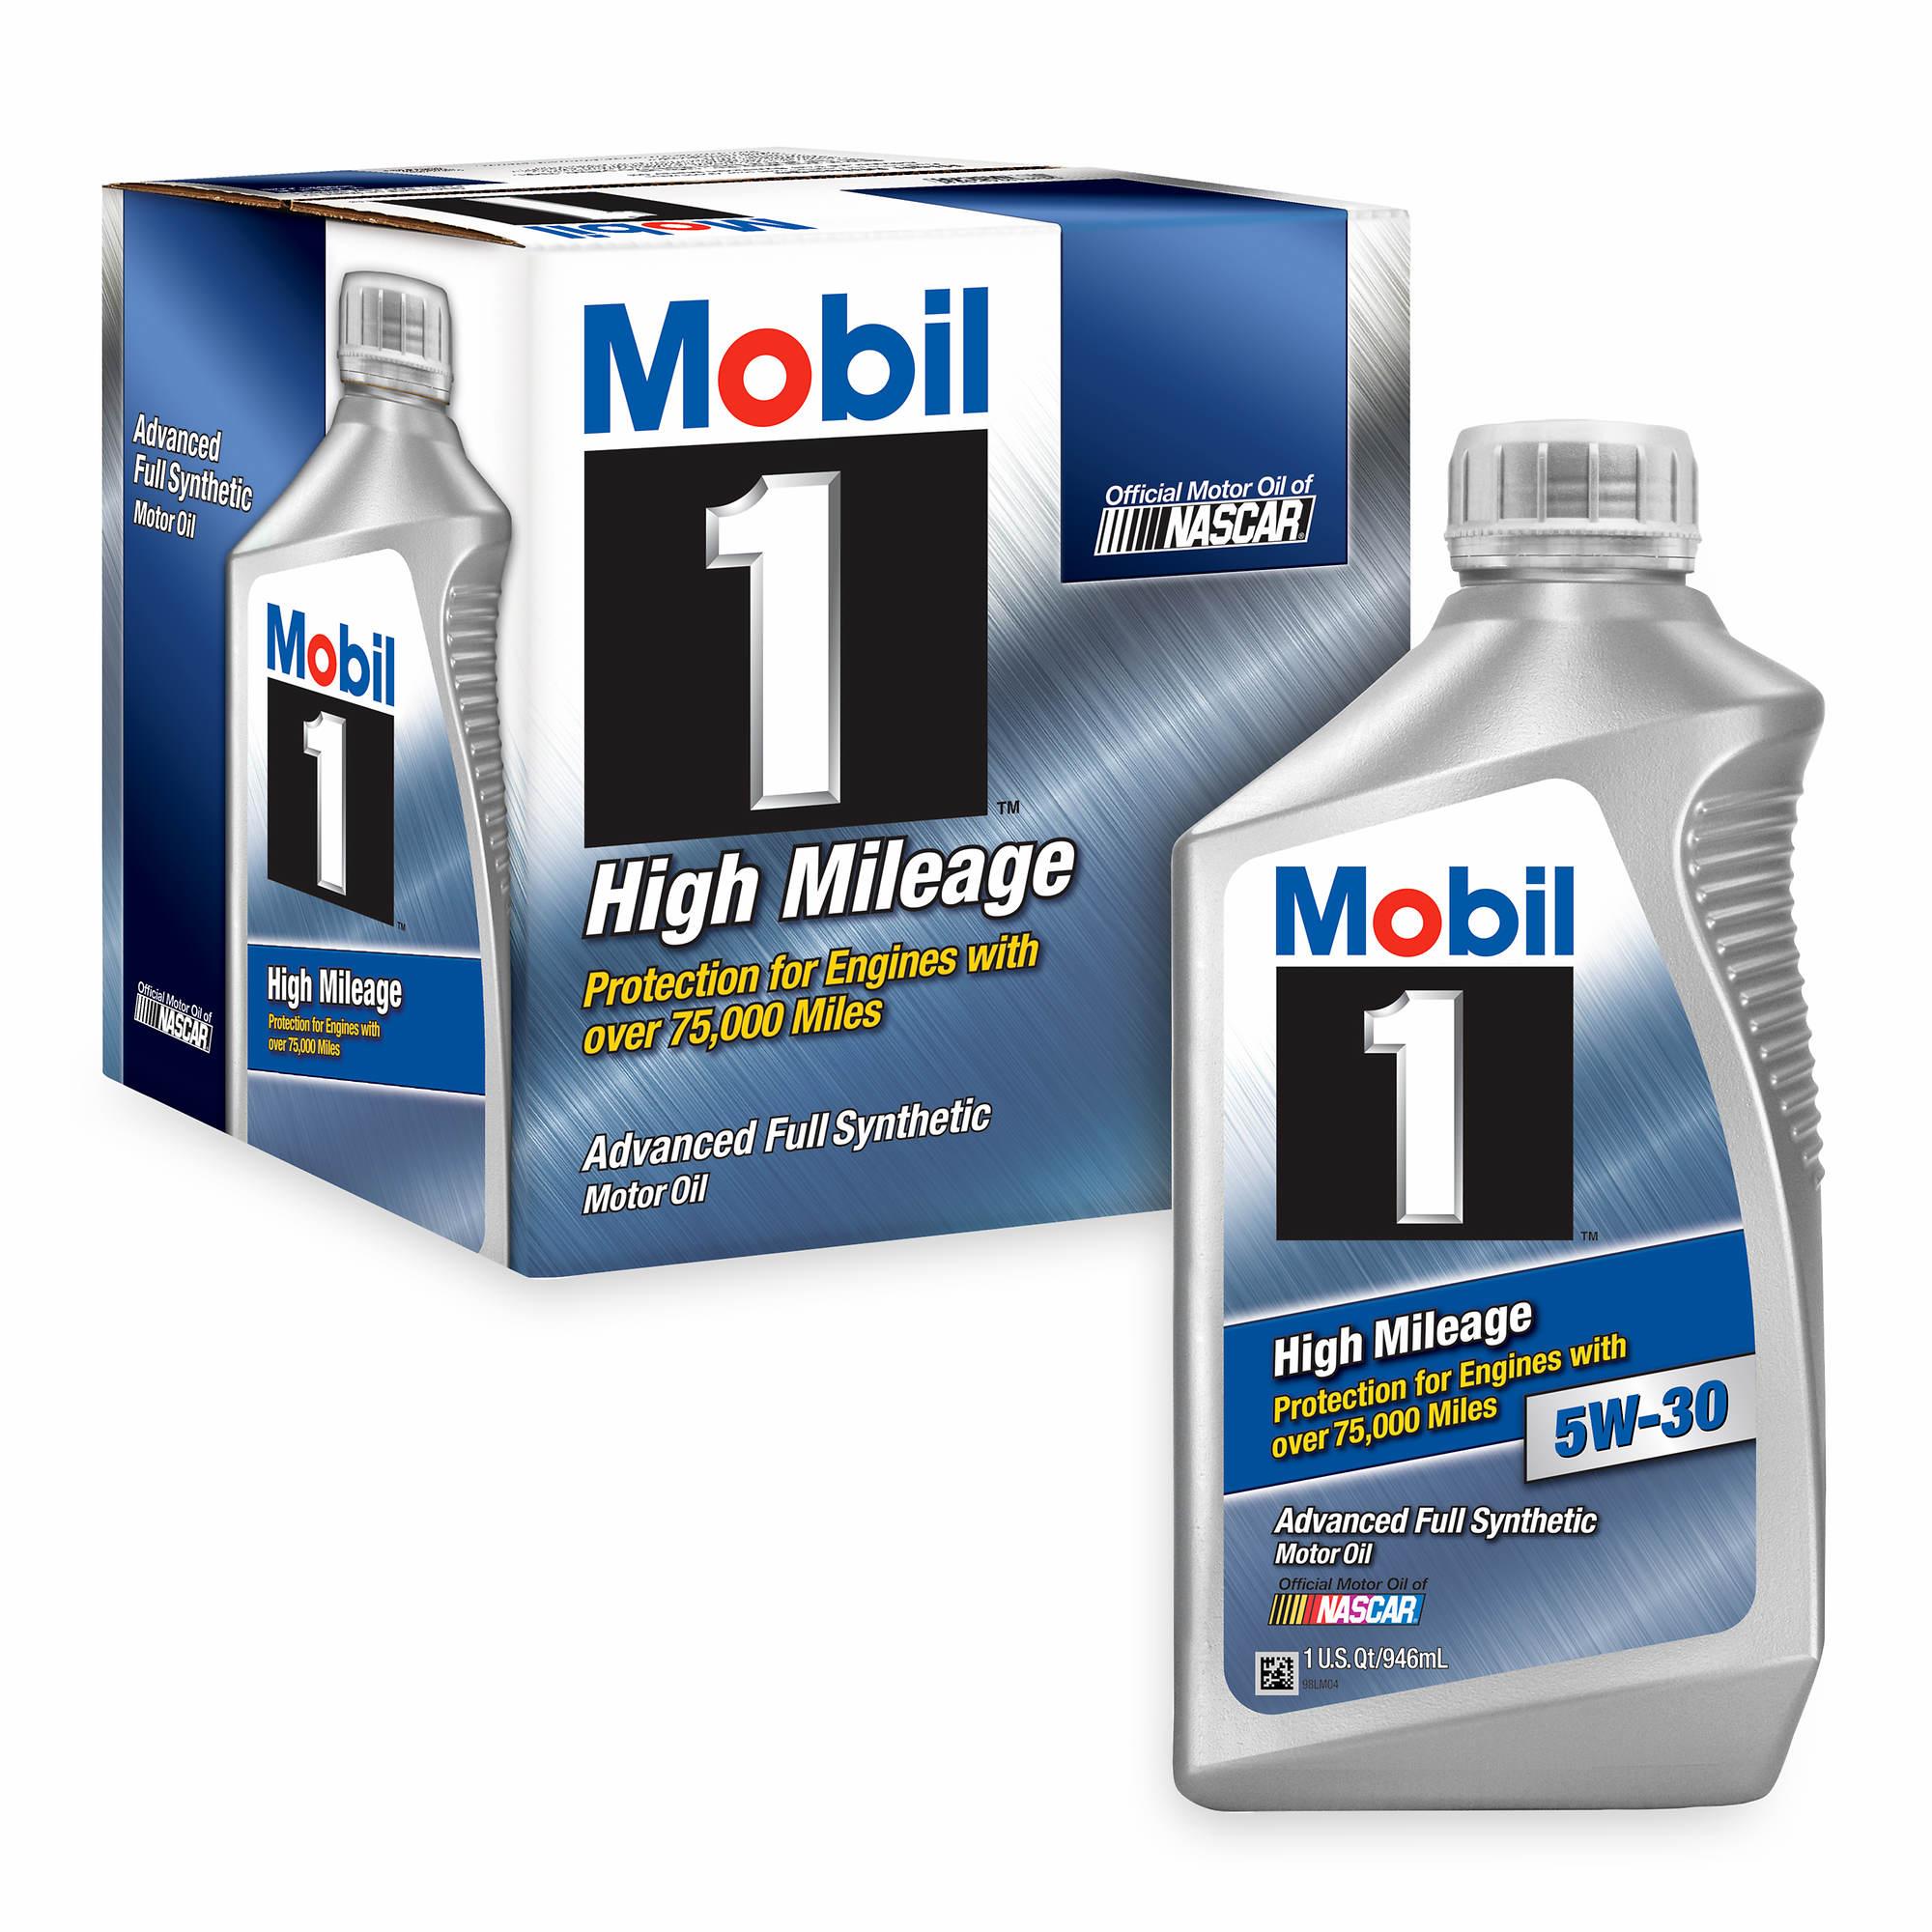 Mobil 1 5w30 high mileage synthetic motor oil 6 pk 1 qt for Bulk motor oil prices